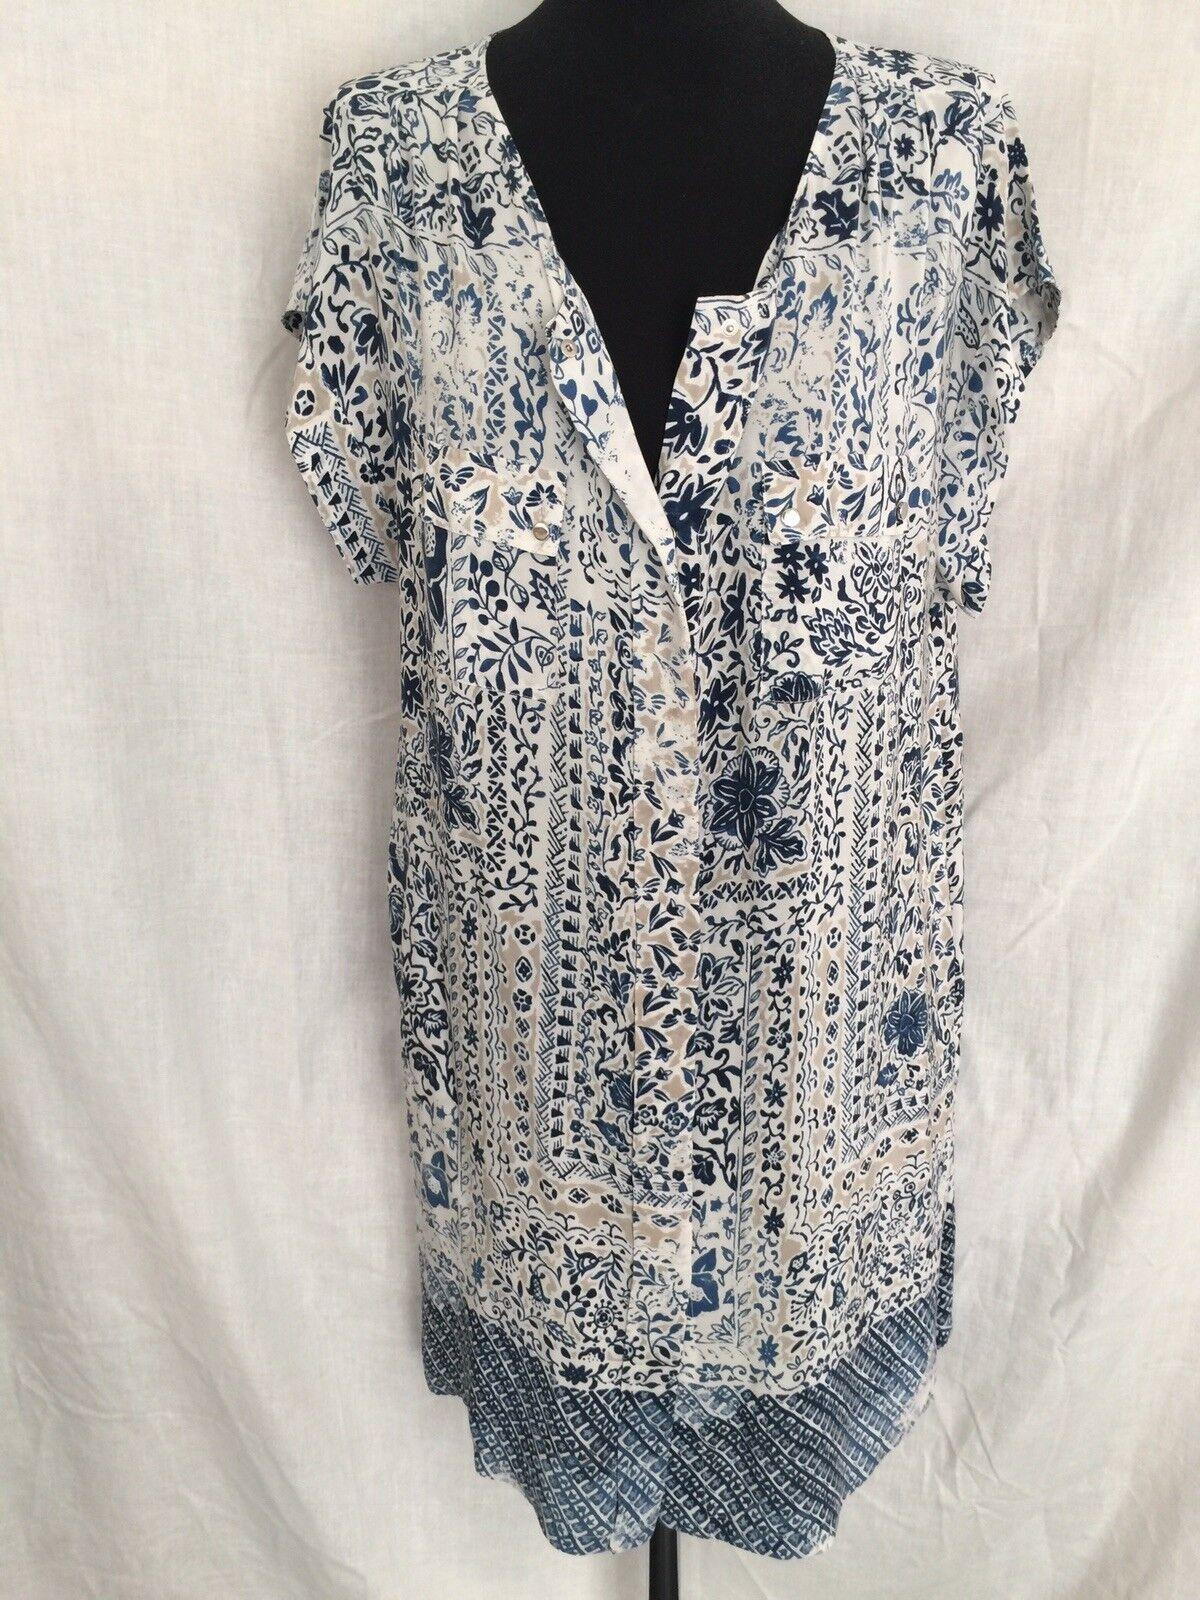 Gerard Darel Silk bluee Print Dress Size Eur 44 (Approx Size 14) Ex Con